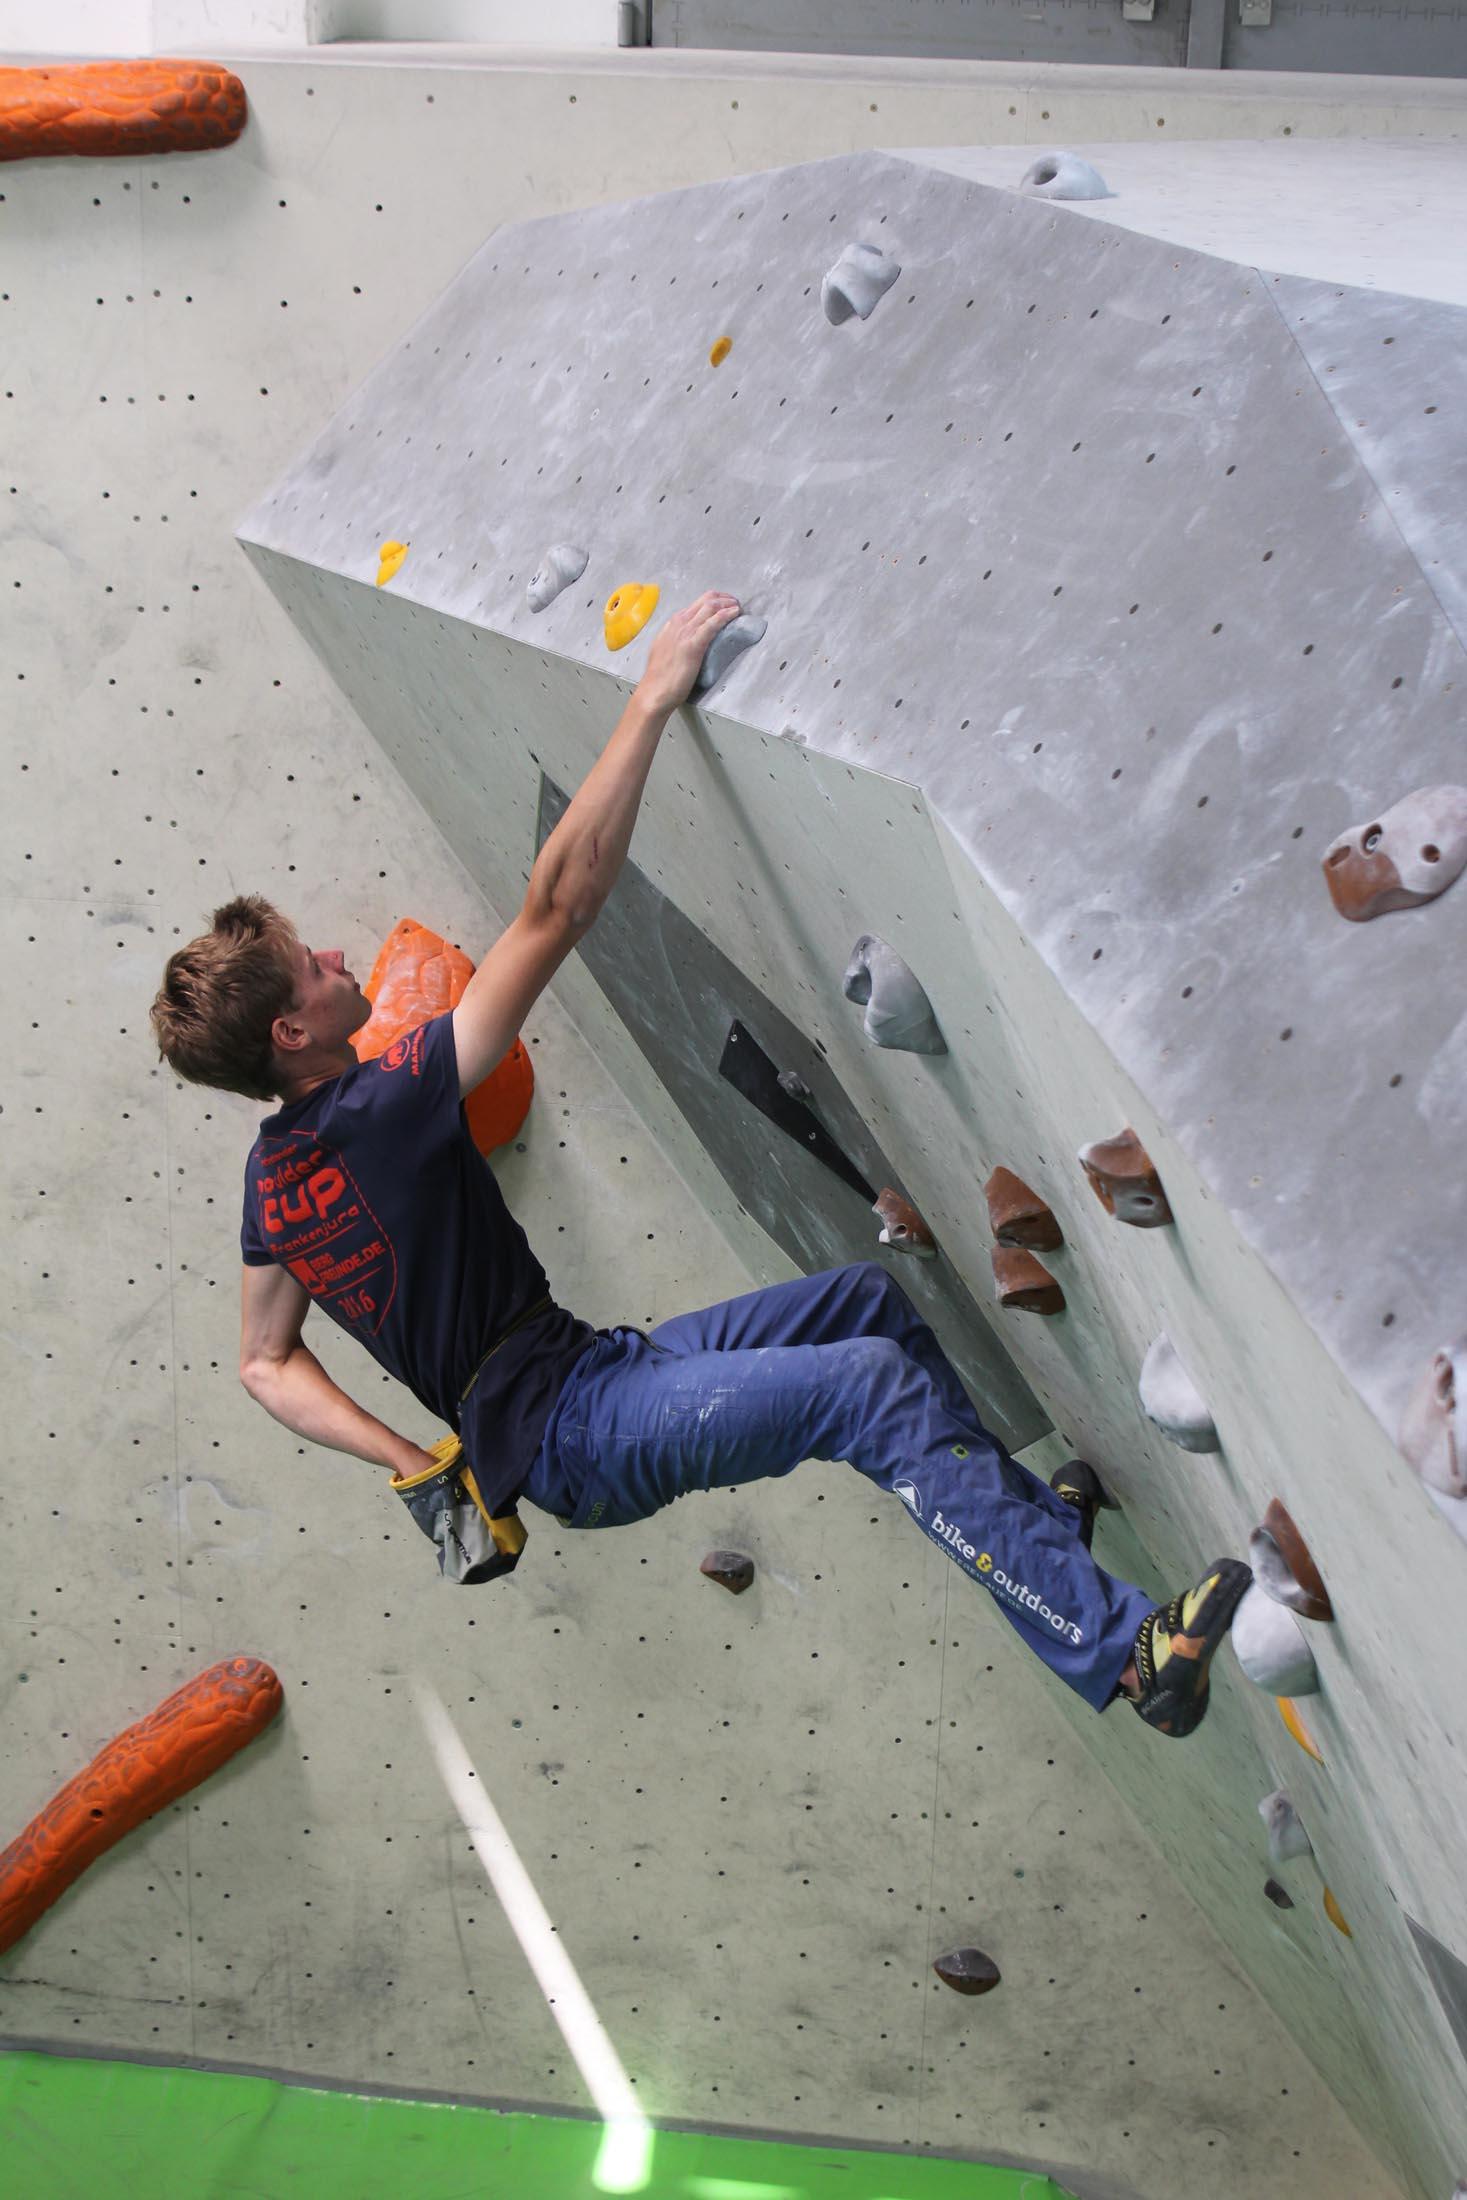 Quali, internationaler bouldercup Frankenjura 2016, BLOCKHELDEN Erlangen, Mammut, Bergfreunde.de, Boulderwettkampf07092016098